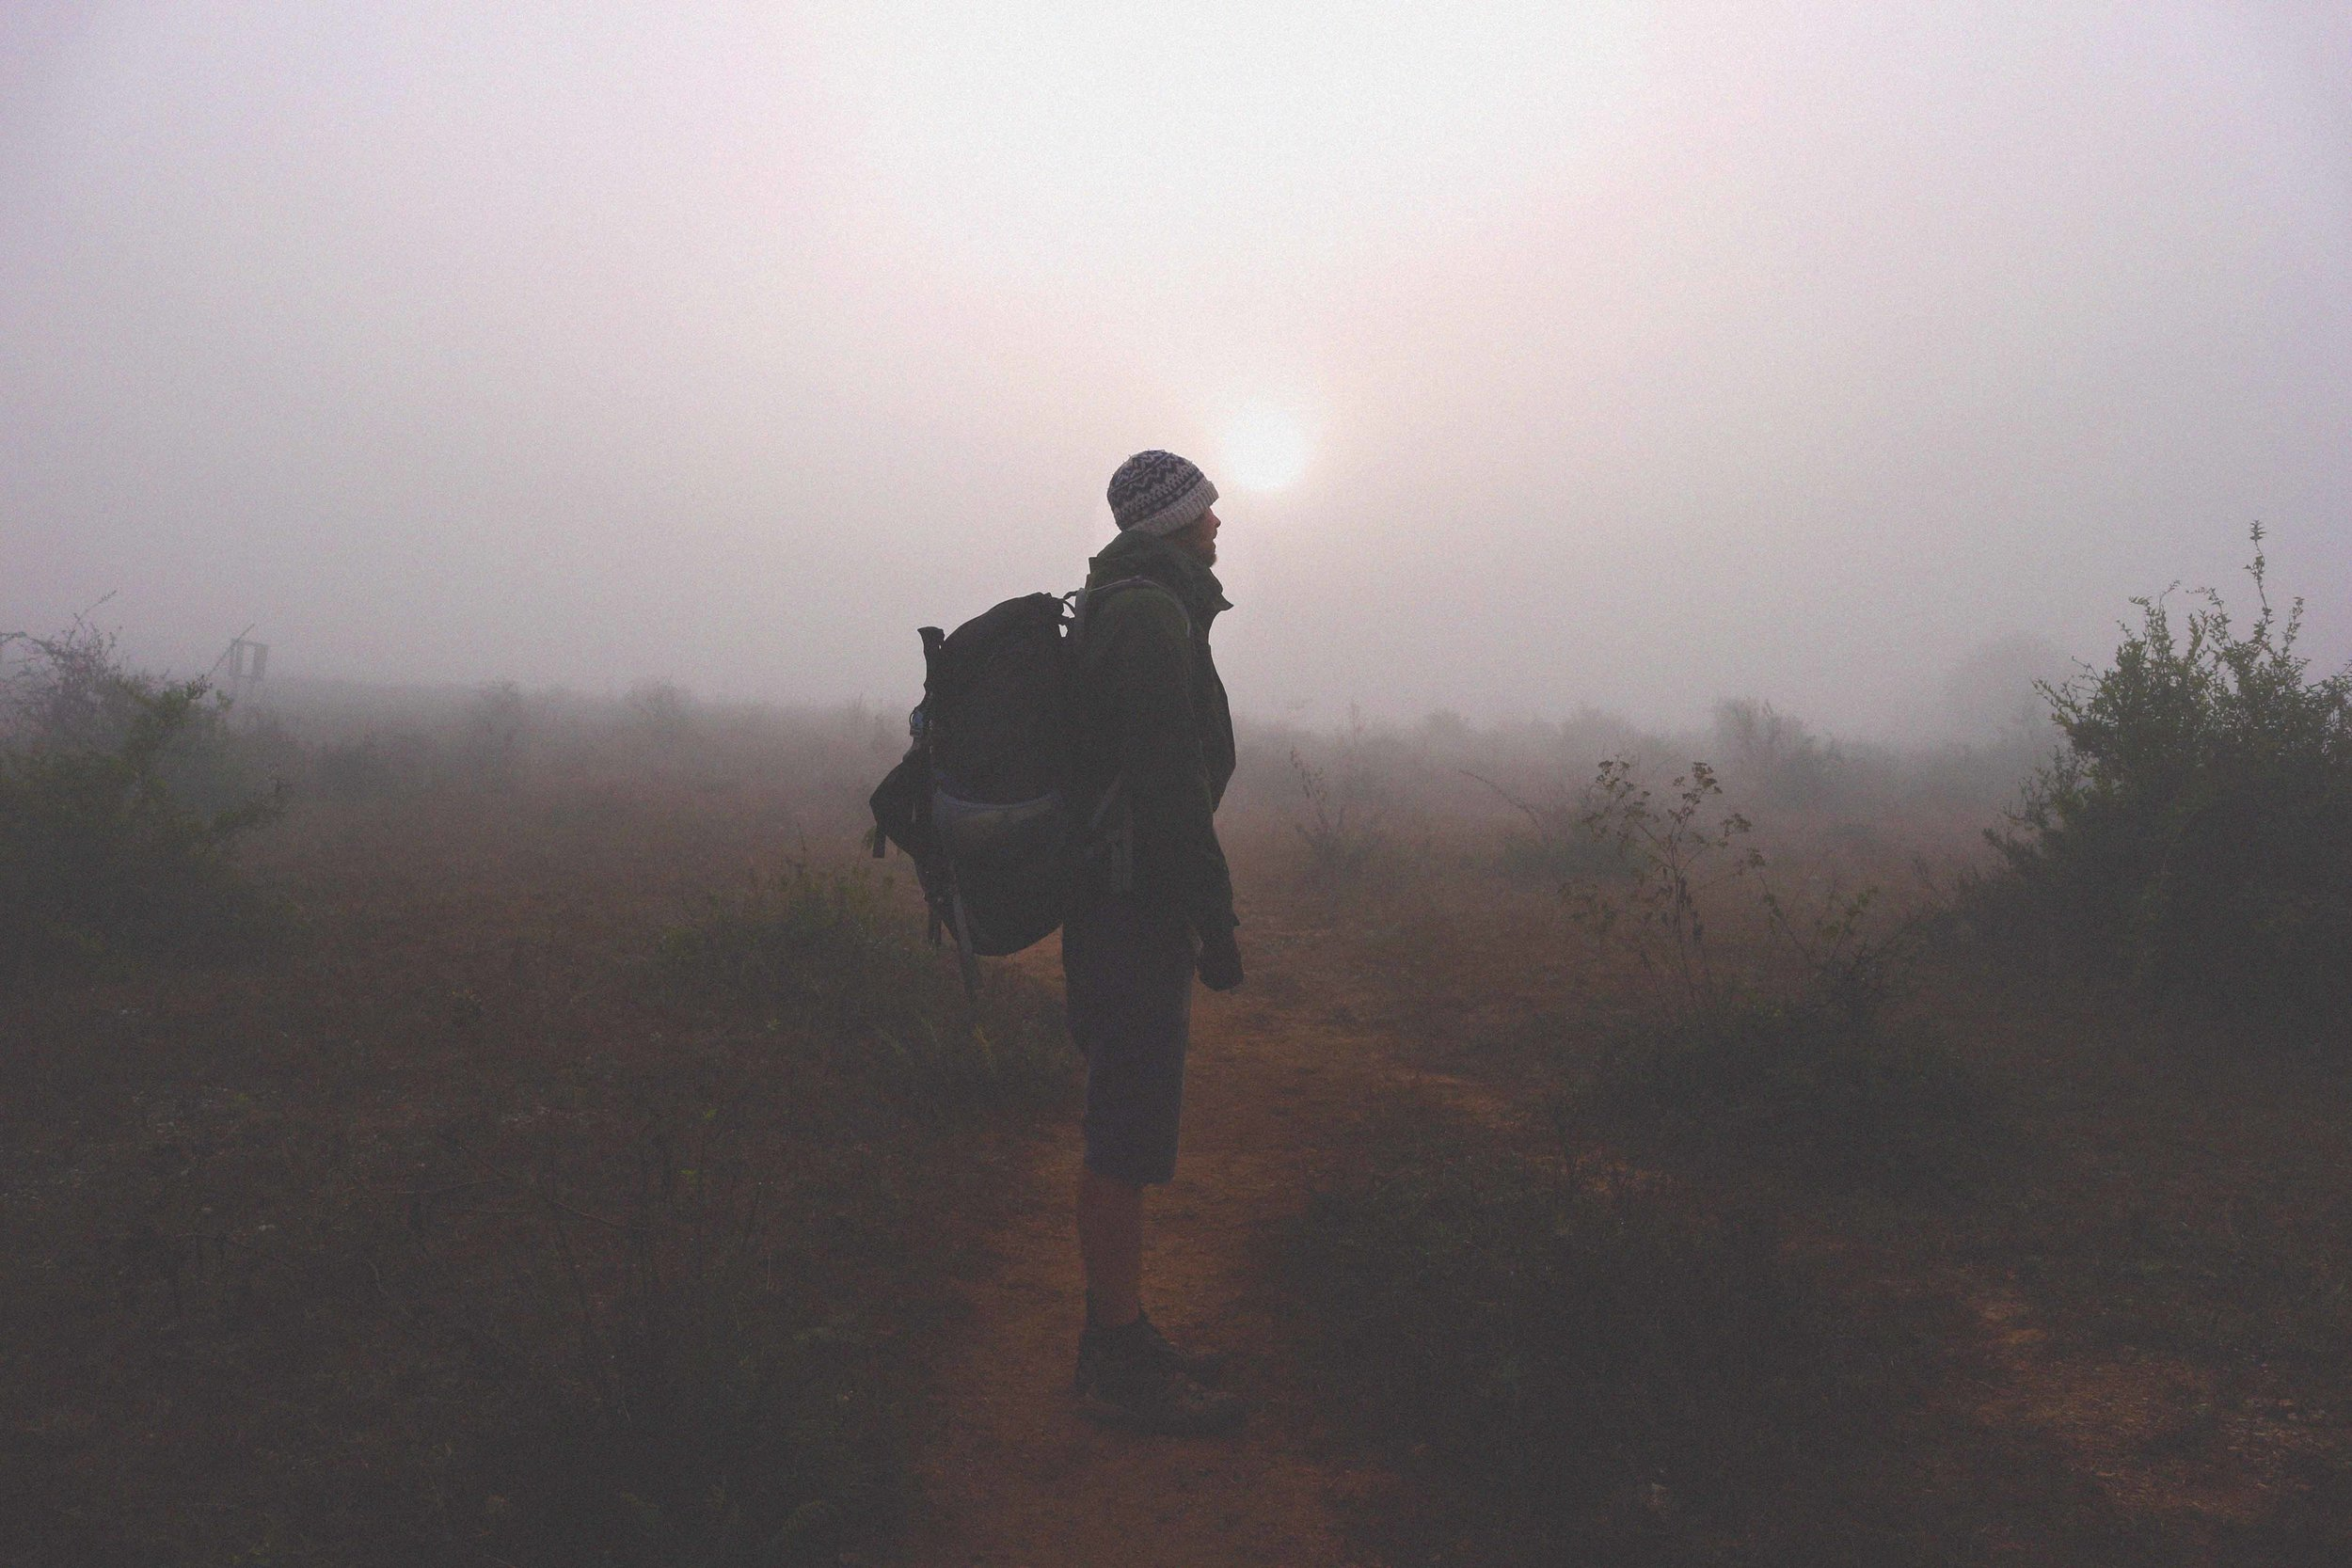 A misty start from Htee Dein